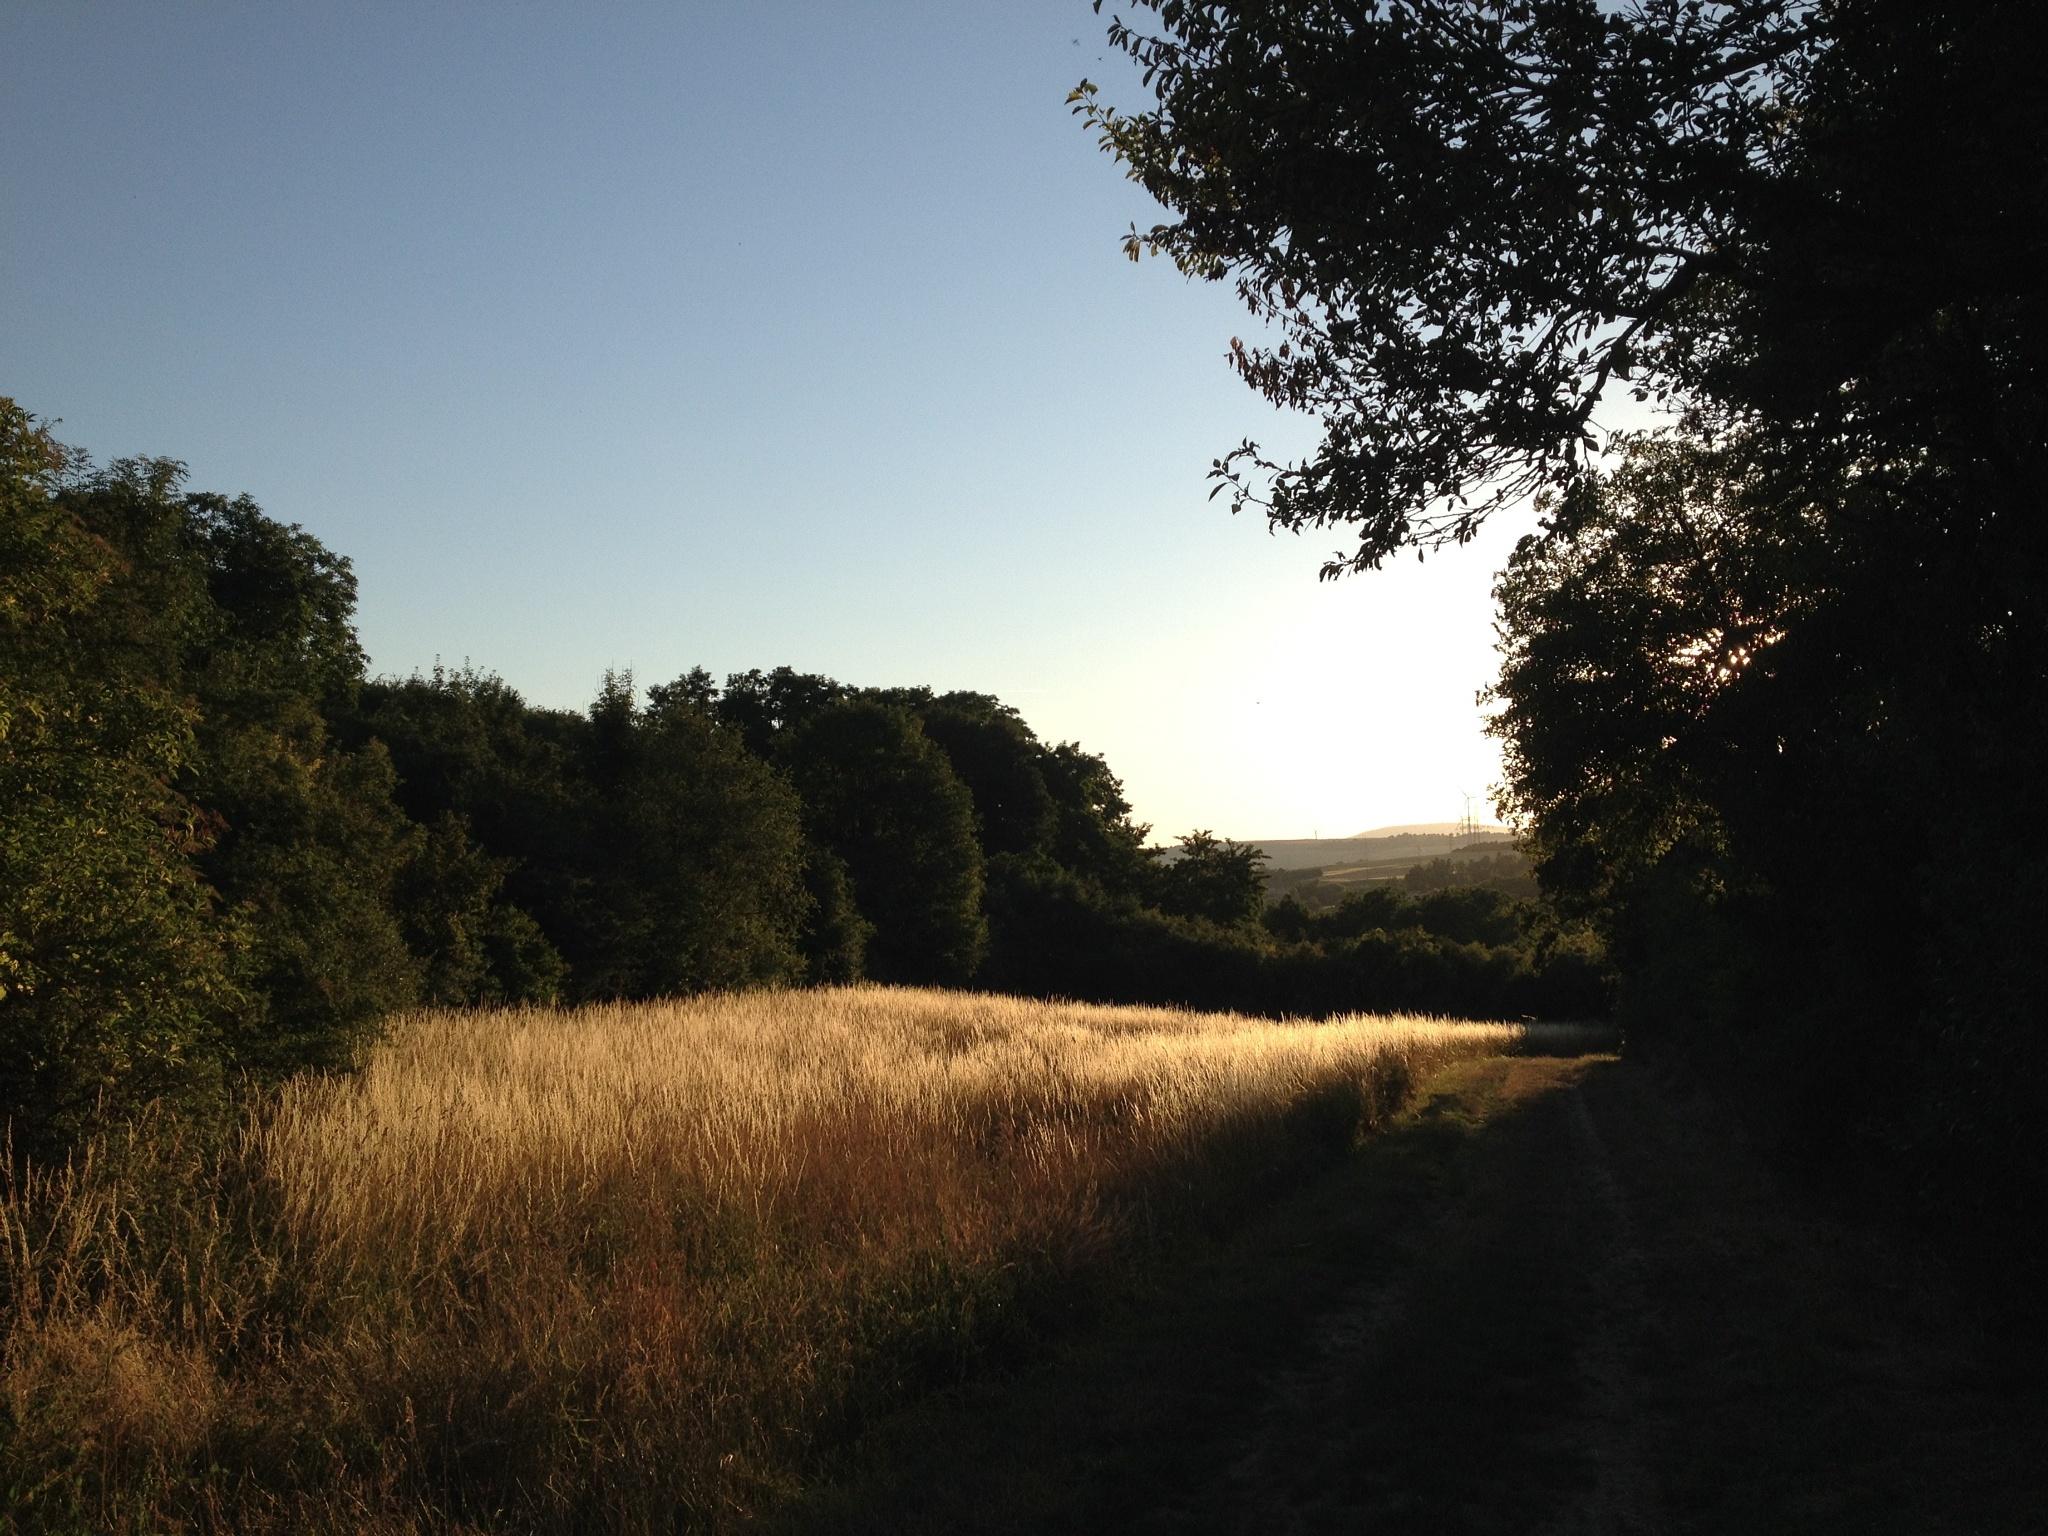 Golden pasture by Katy Haecker